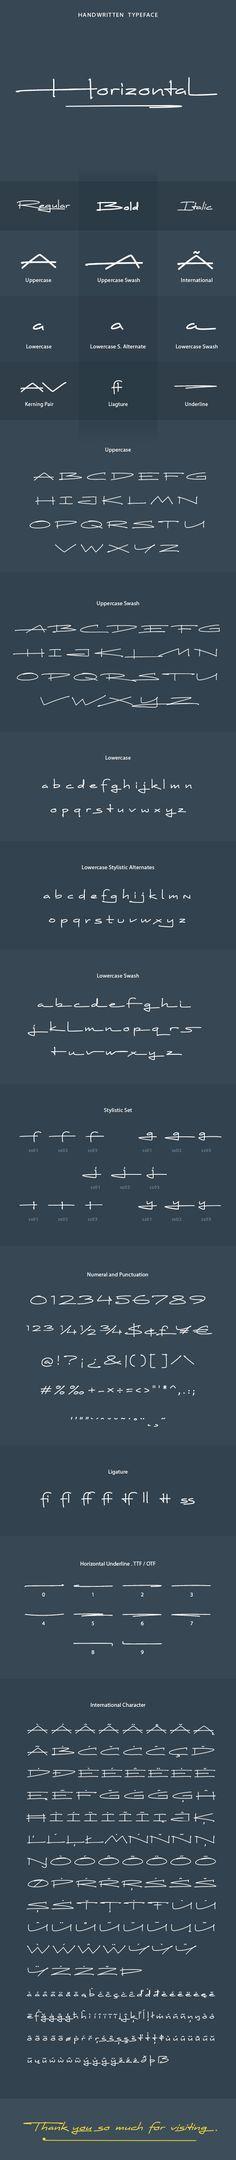 Horizontal Font - #Hand-writing #Script